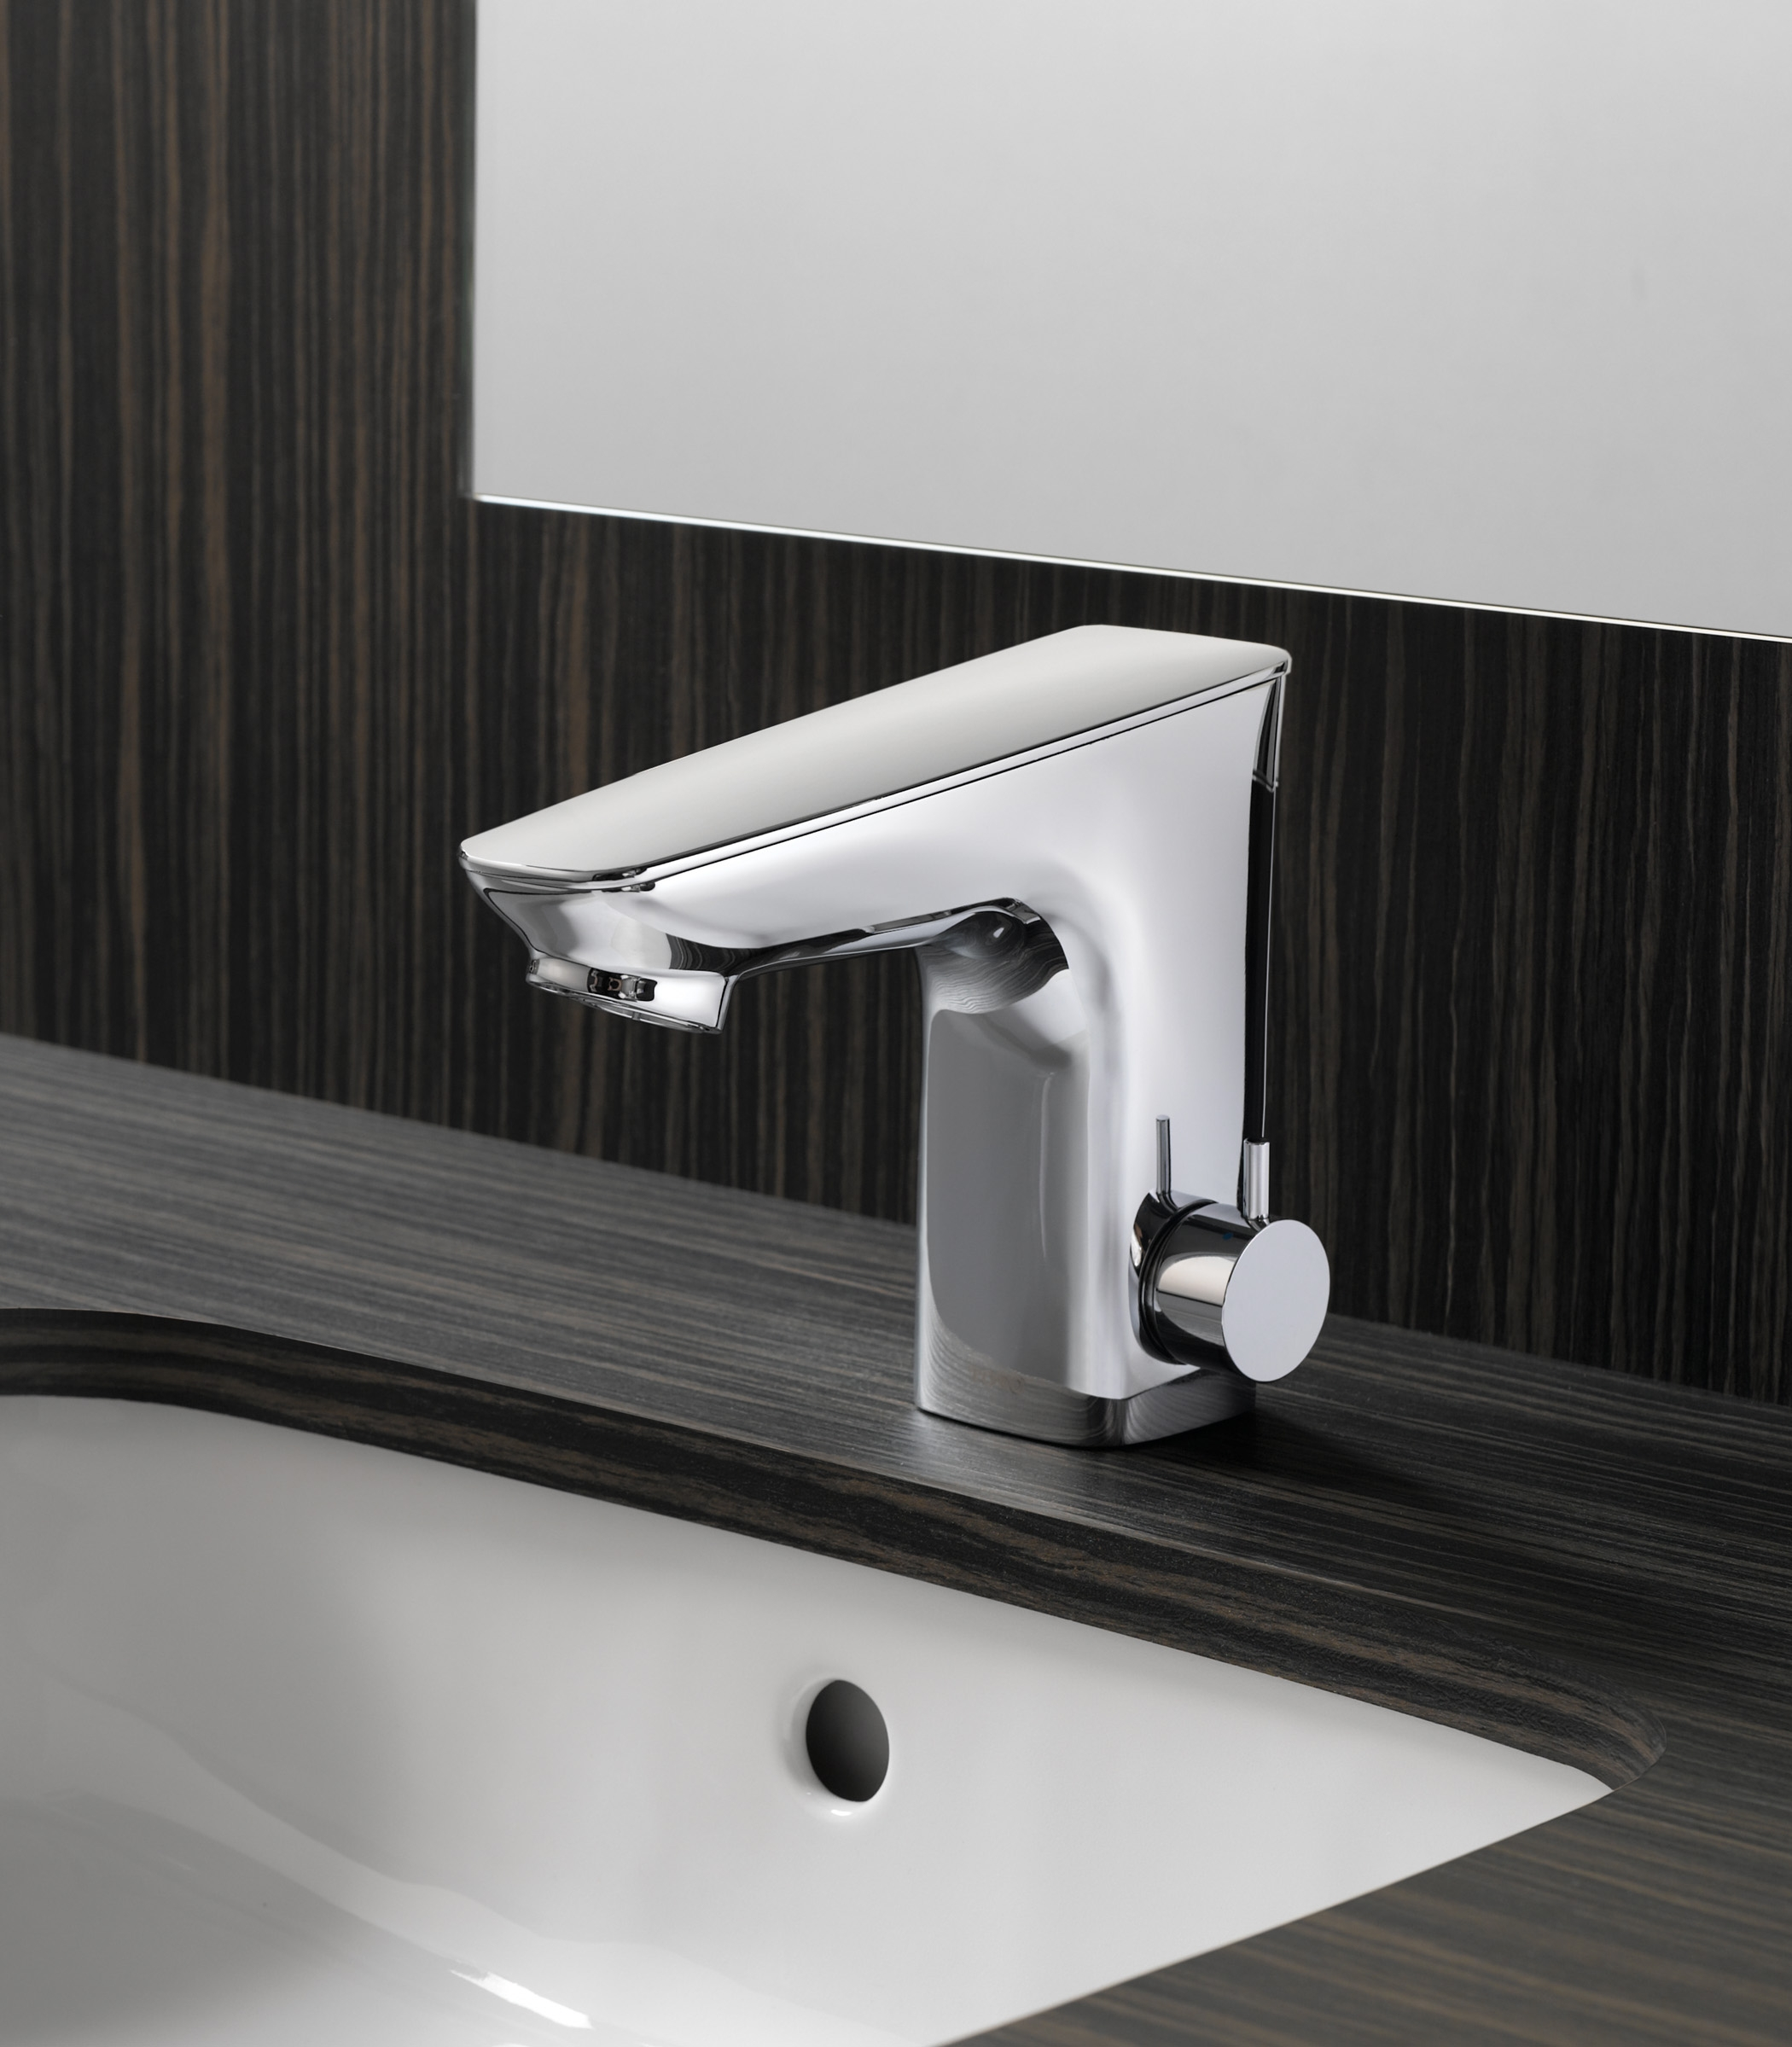 Ideas, toto sensor faucet and lavatory toto sensor faucet and lavatory 45 toto shower valve shower and tub valves bathroom sinks 2100 x 2399  .